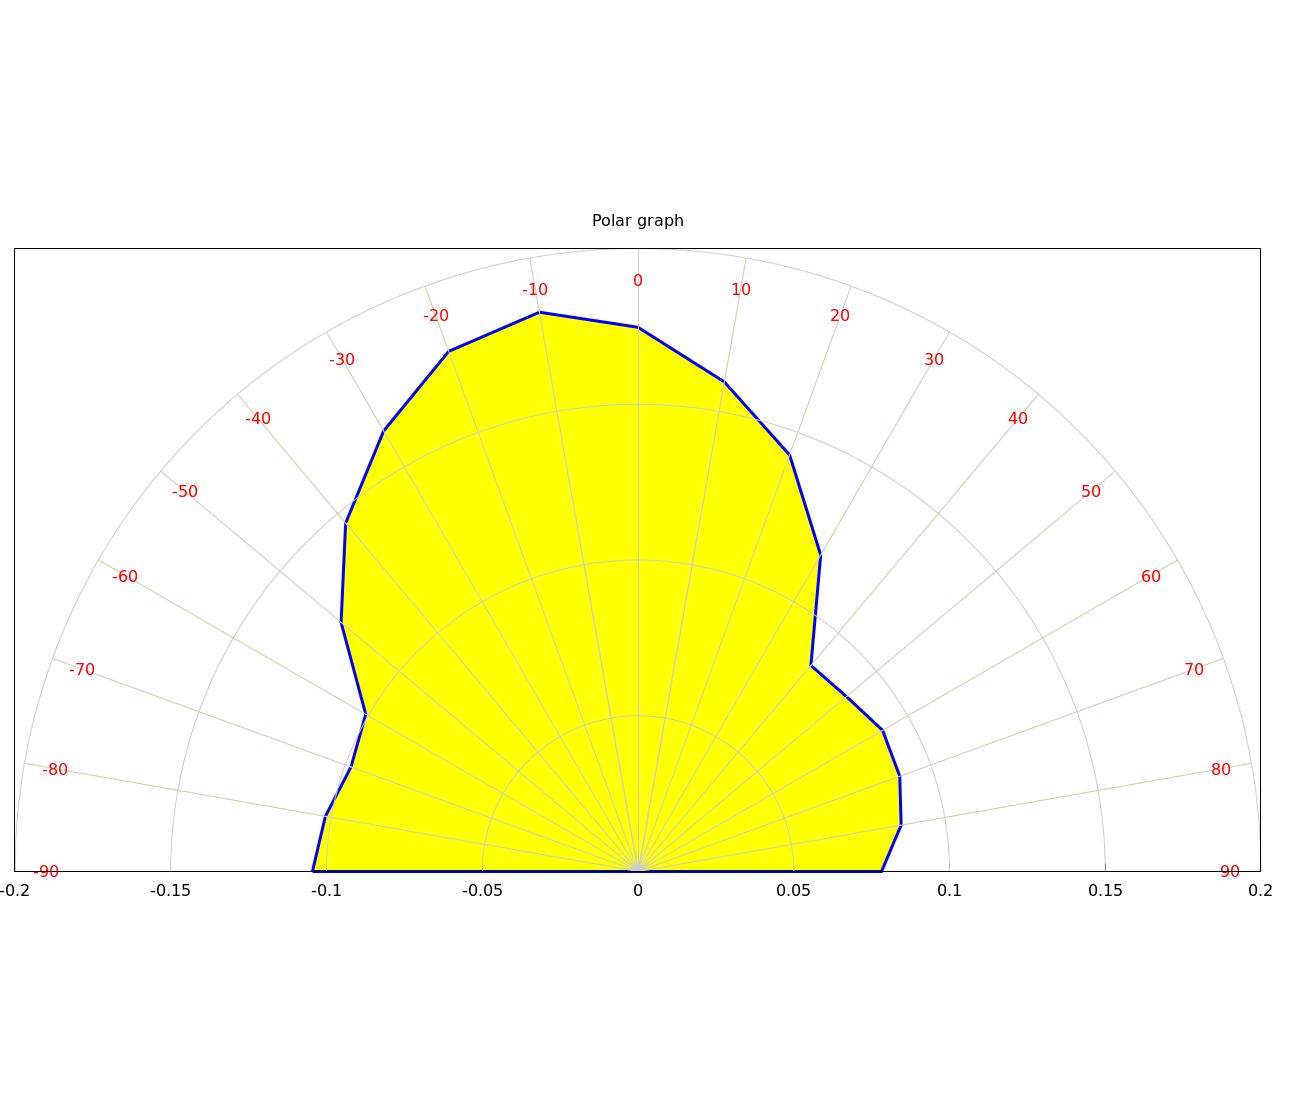 http://forum.matematika.cz/upload3/img/2018-02/26226_Bez%2Bn%25C3%25A1zvu%2B3.png